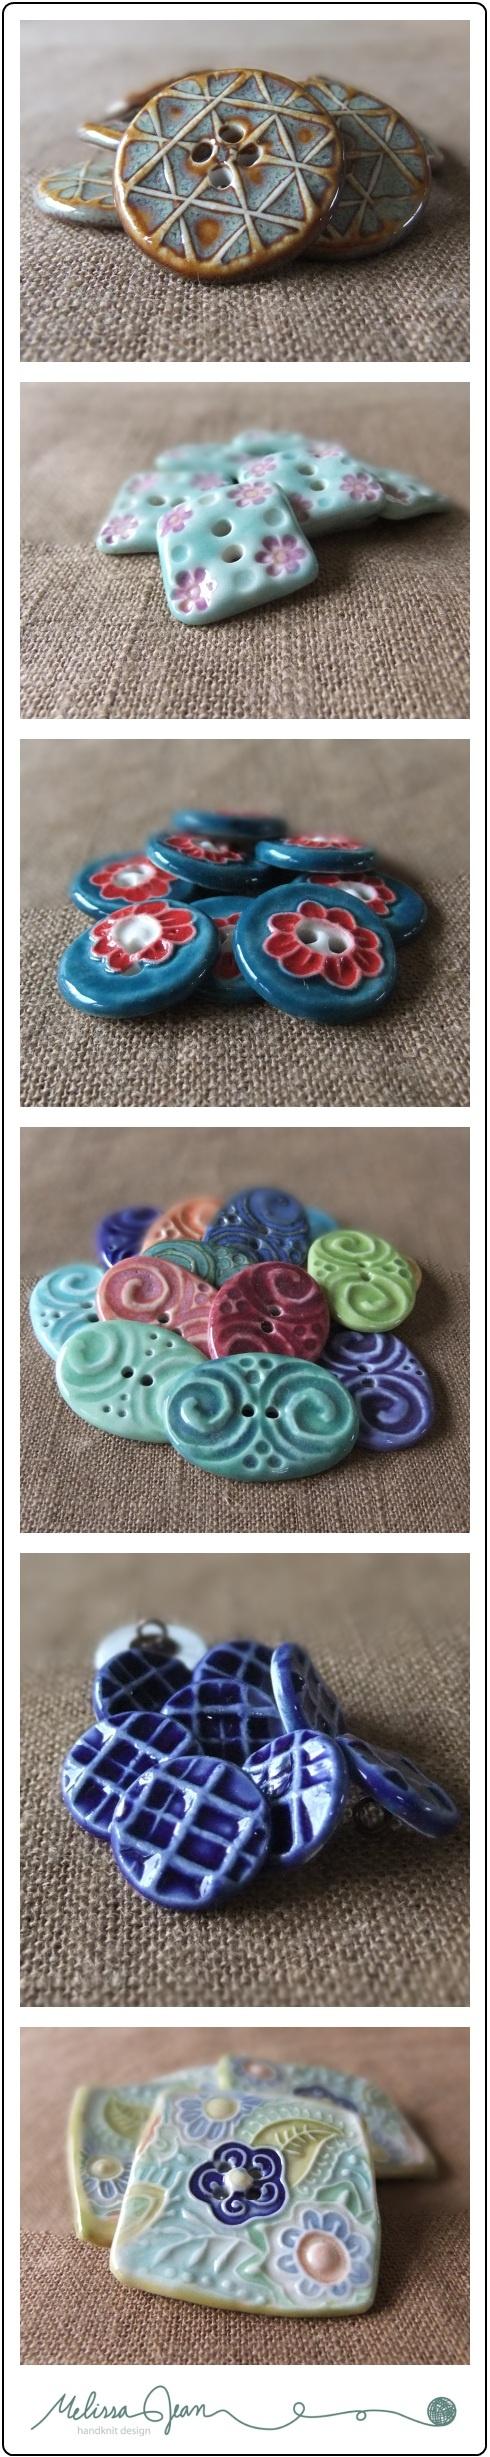 best ceramic u pottery images on pinterest ceramic art